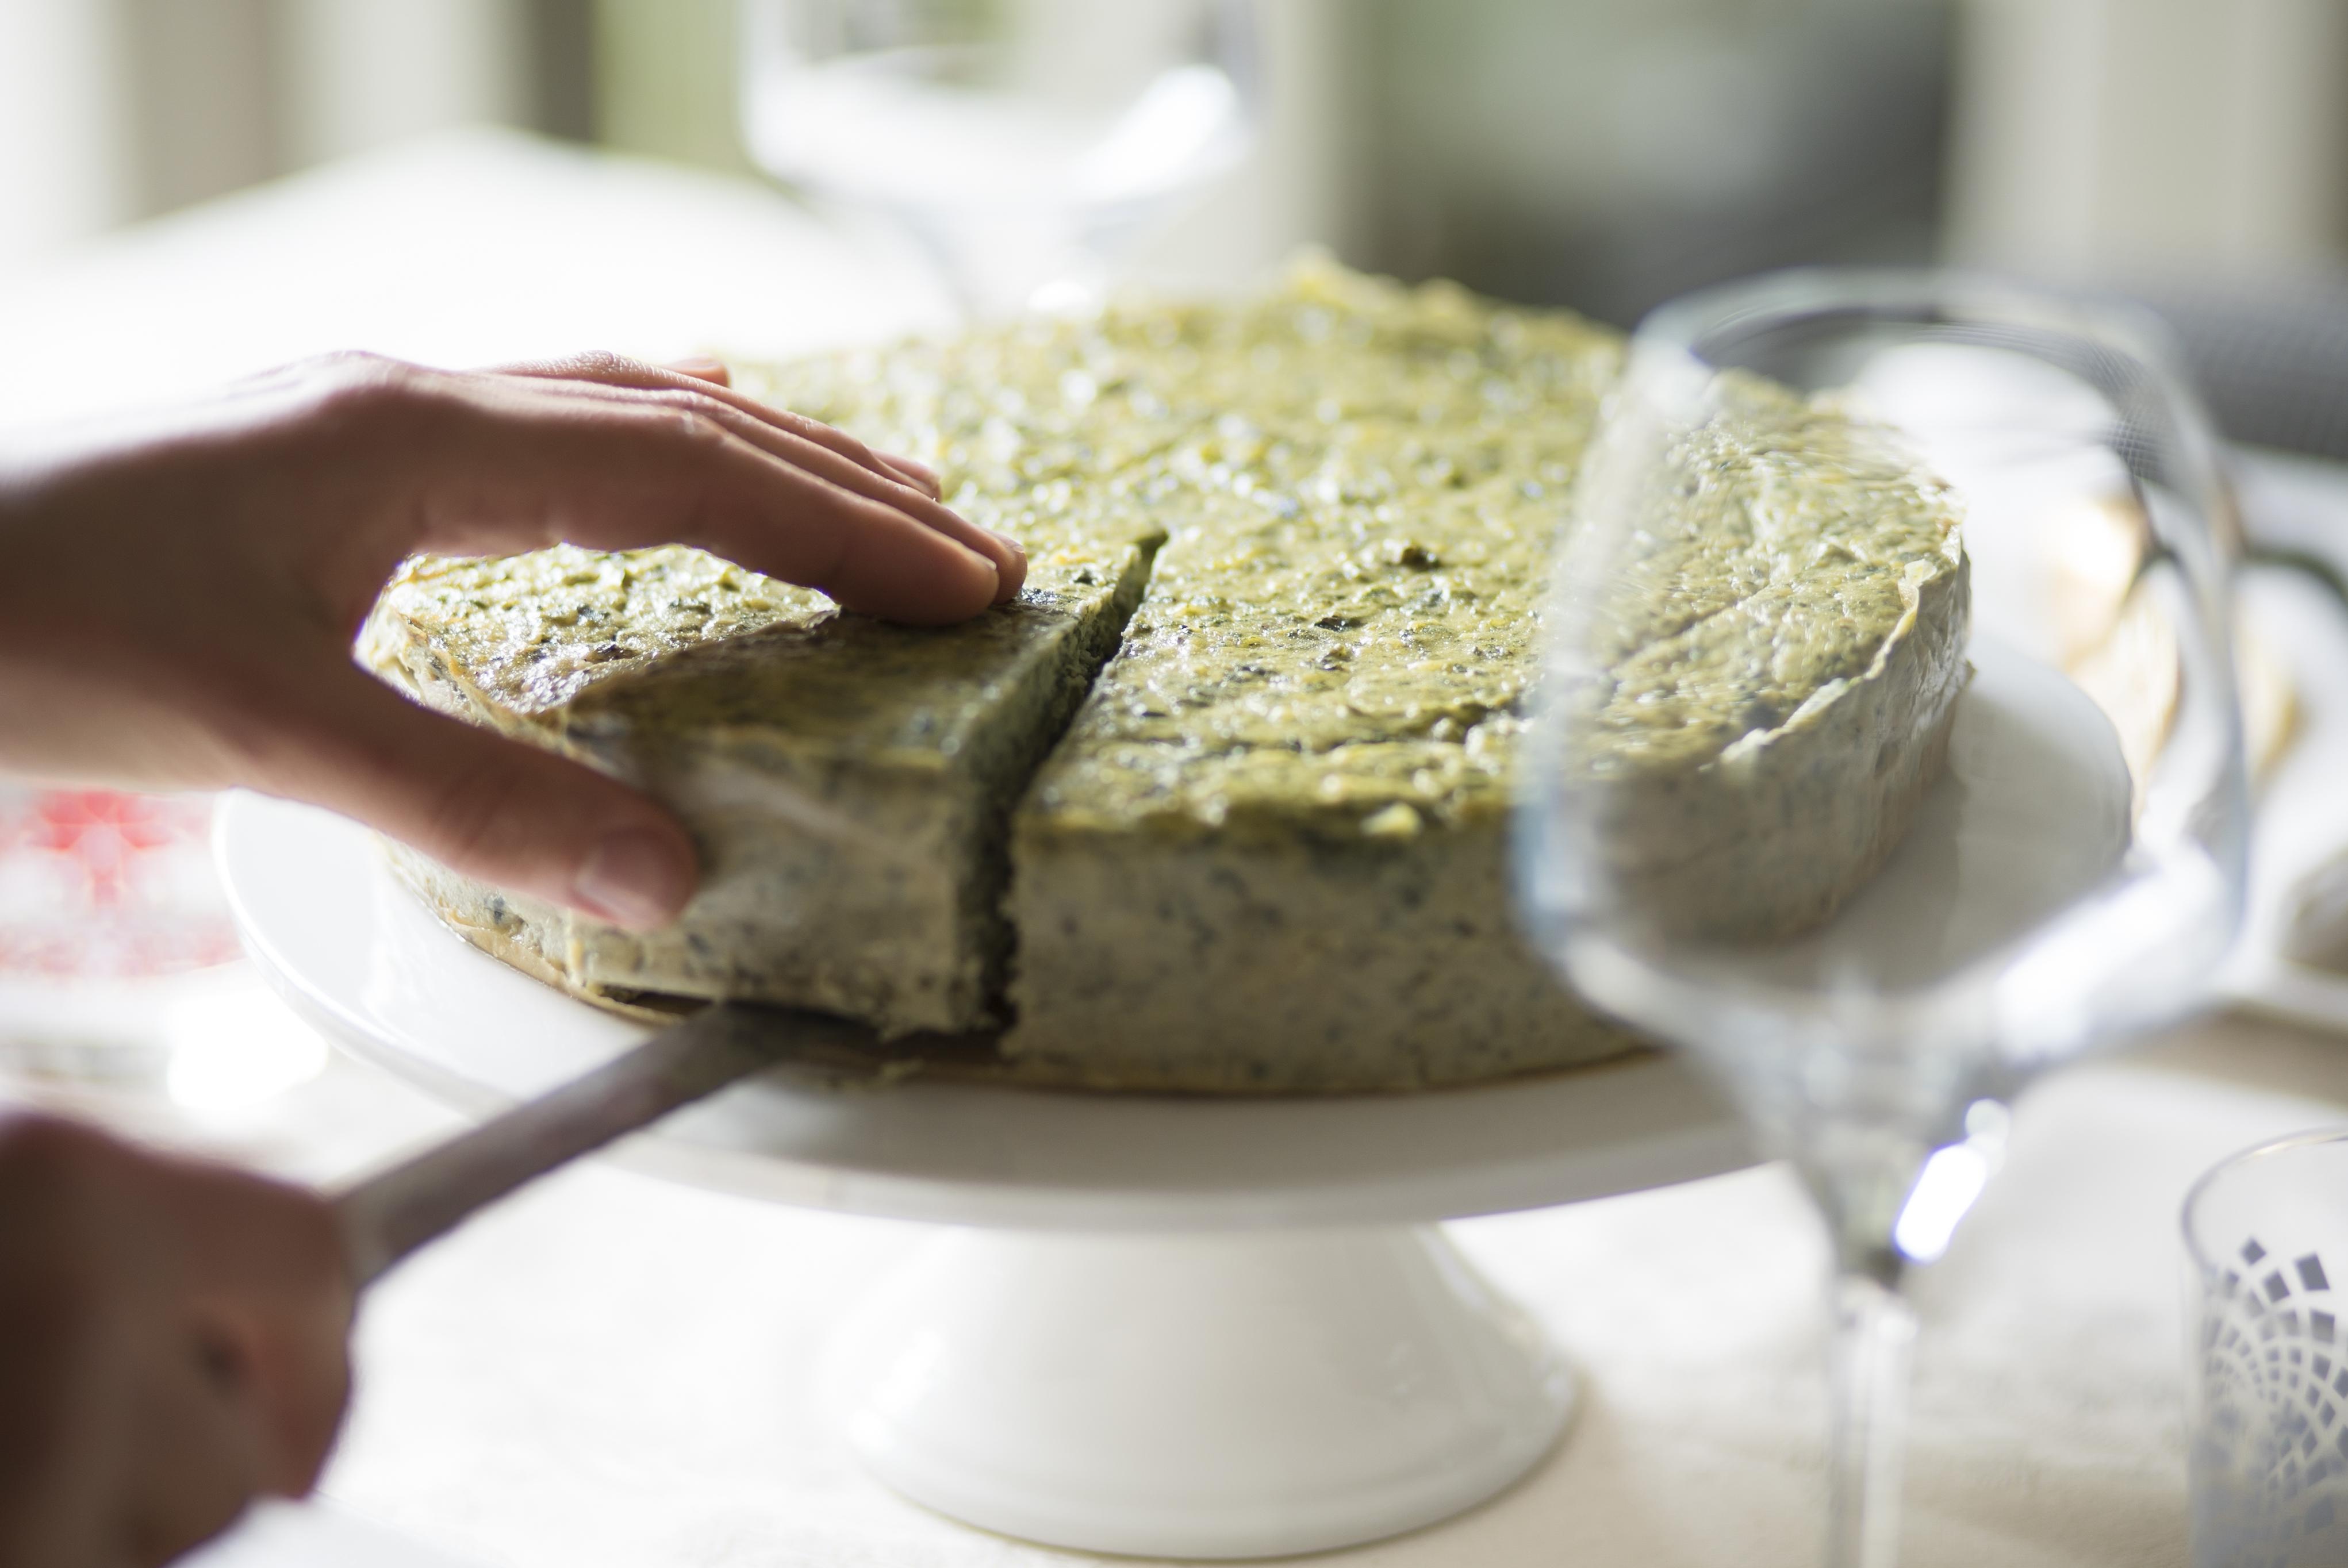 Ricotta Cheesecake with Silverbeet & Prosciutto Cotto Filling